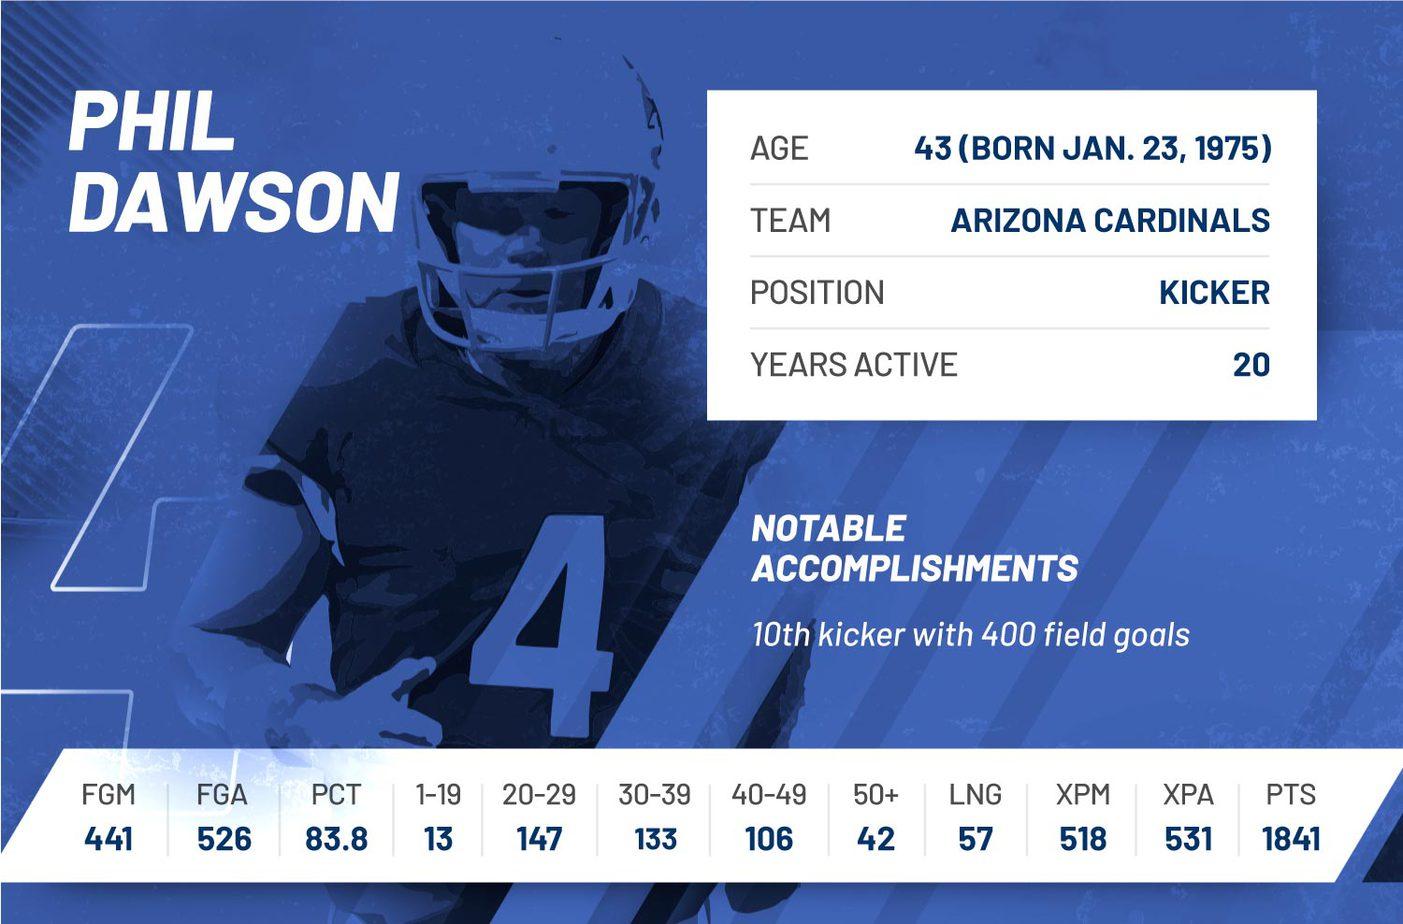 phil dawson nfl regular season 2018 stats